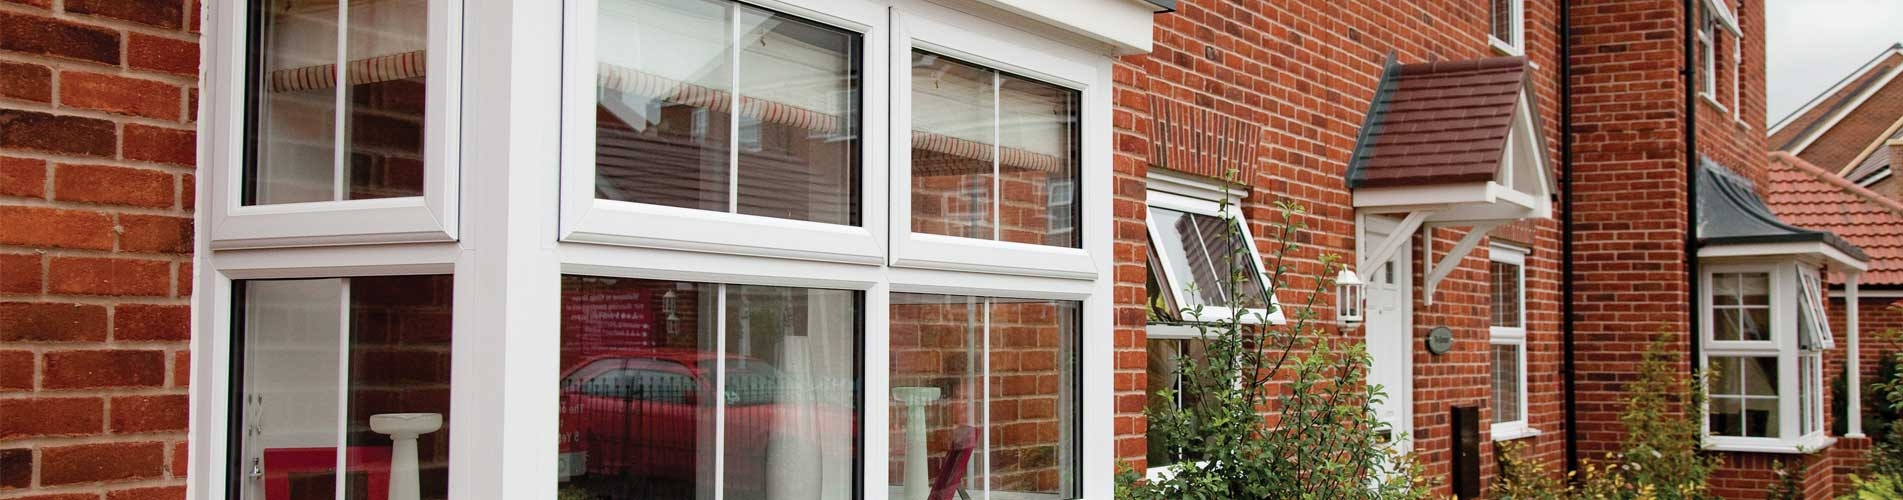 bay windows waterlooville